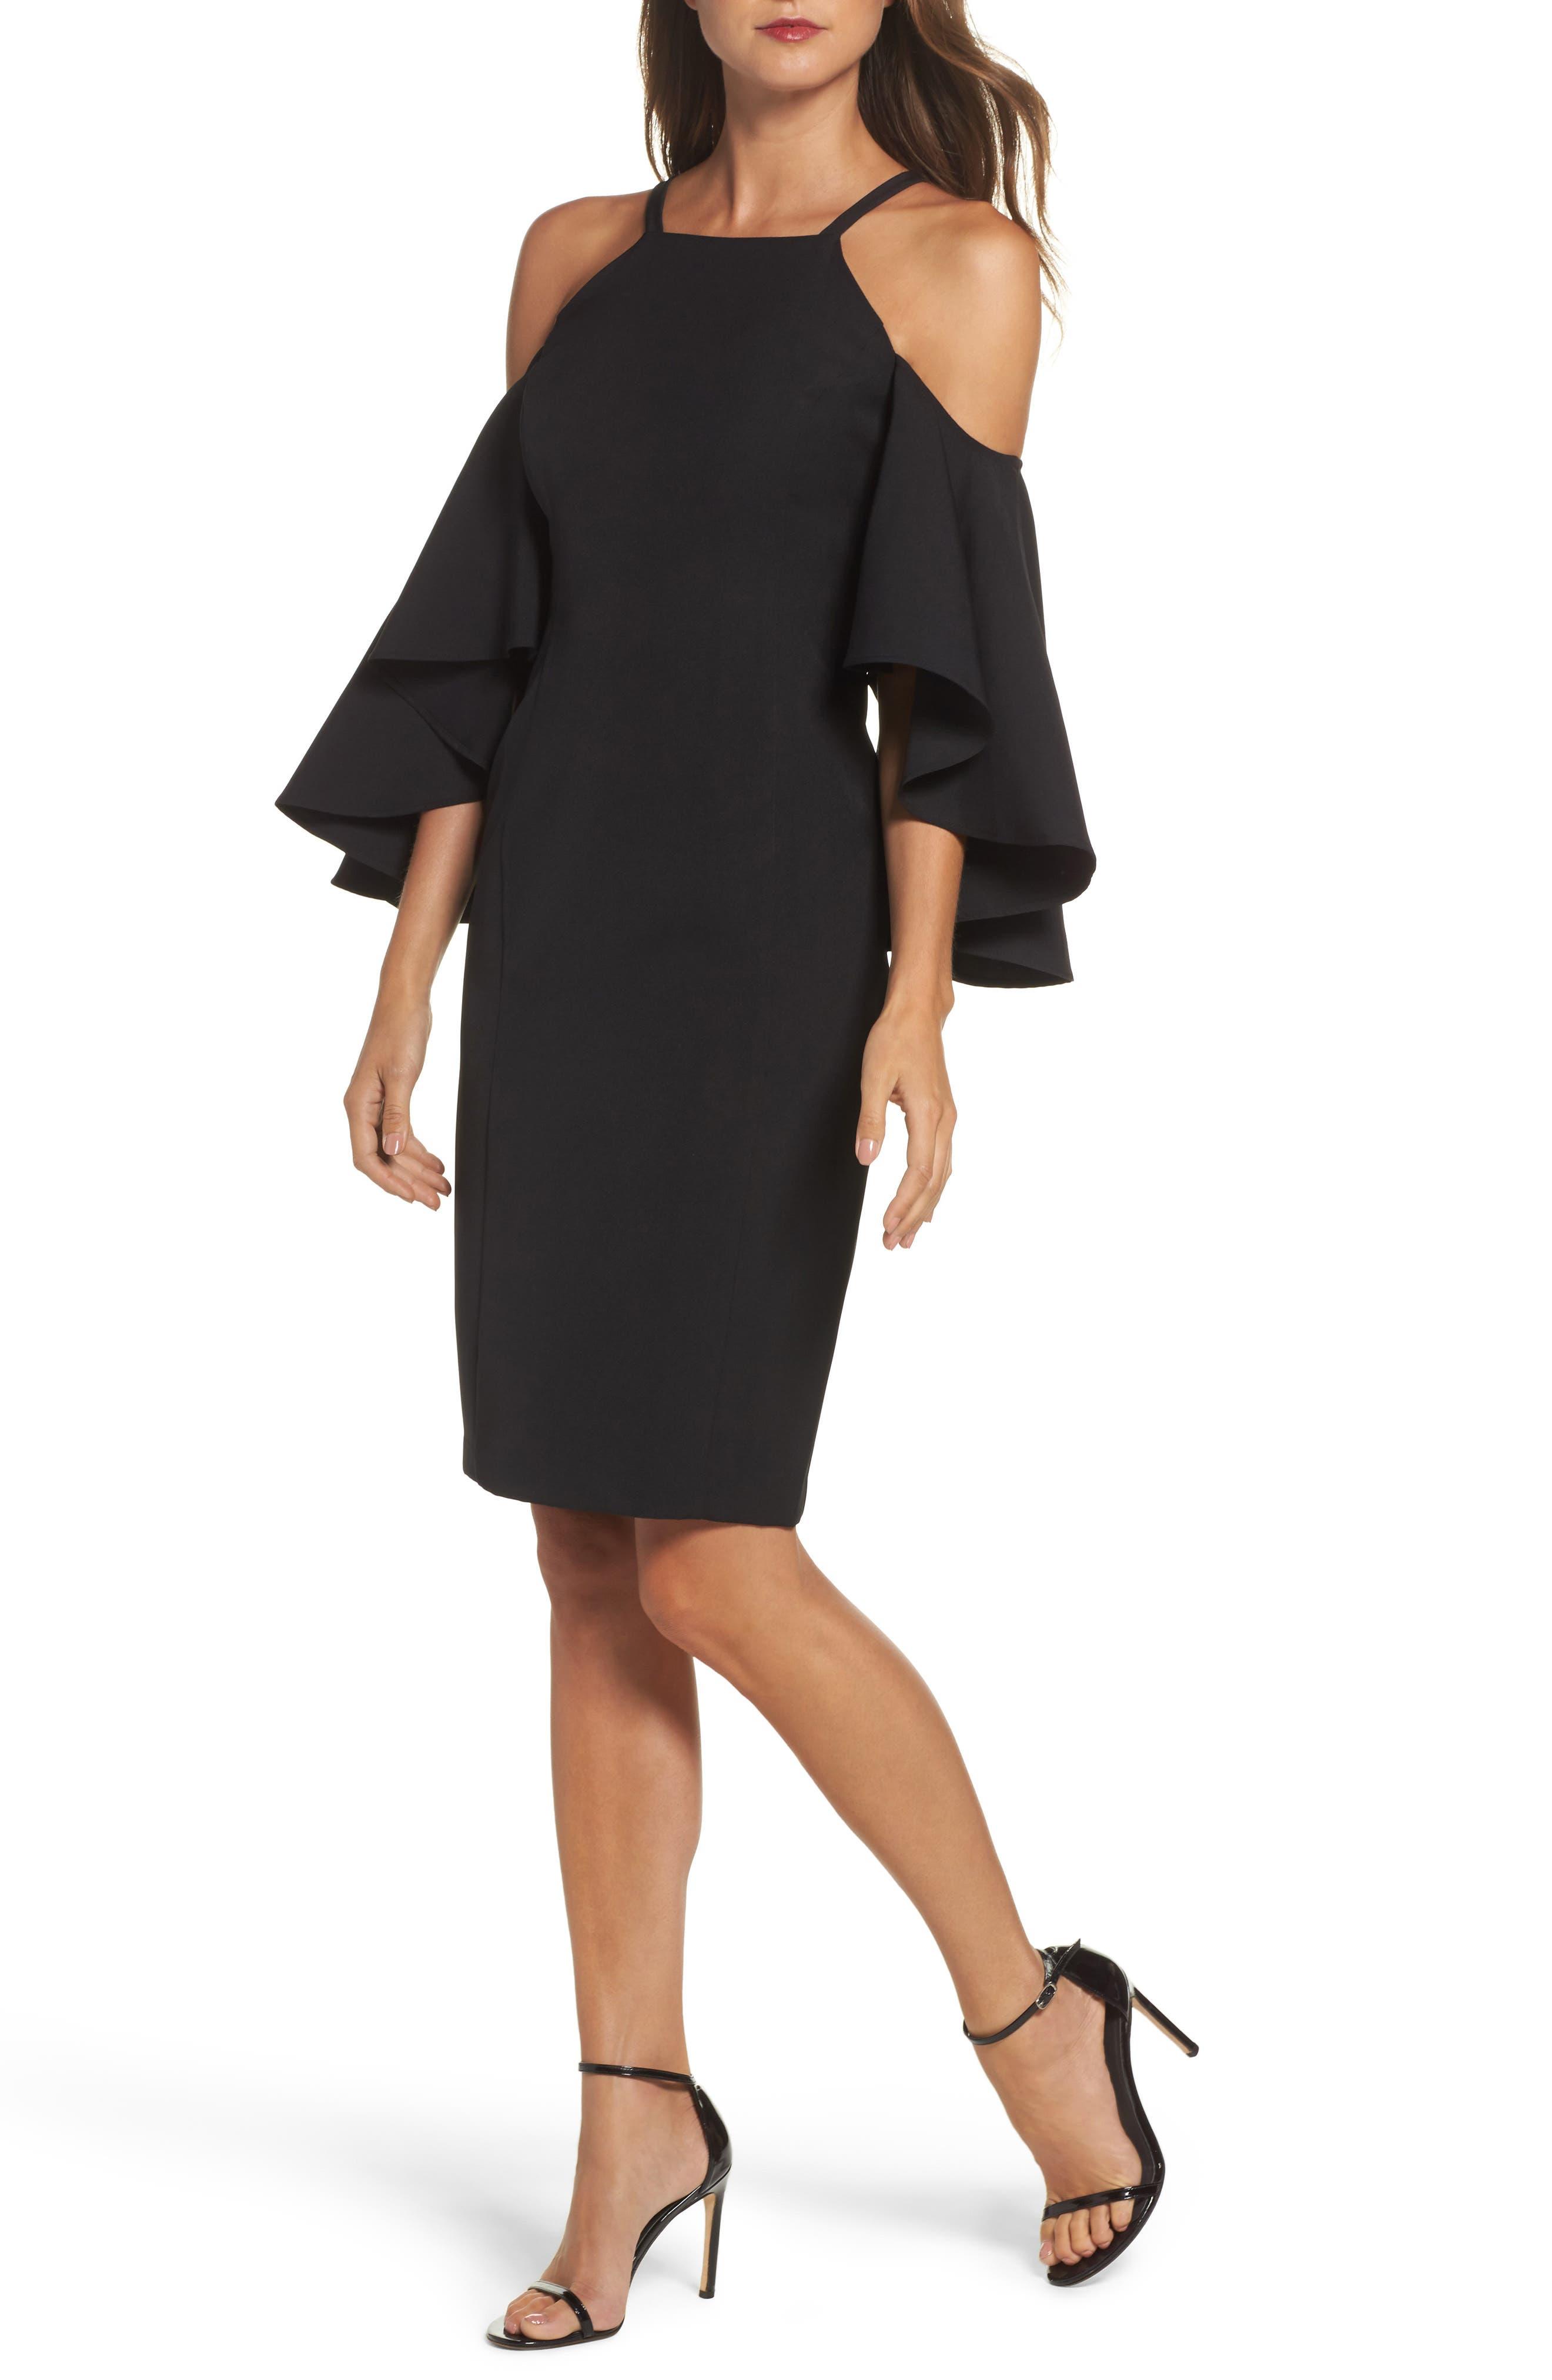 Main Image - Vince Camuto Laguna Cold Shoulder Sheath Dress